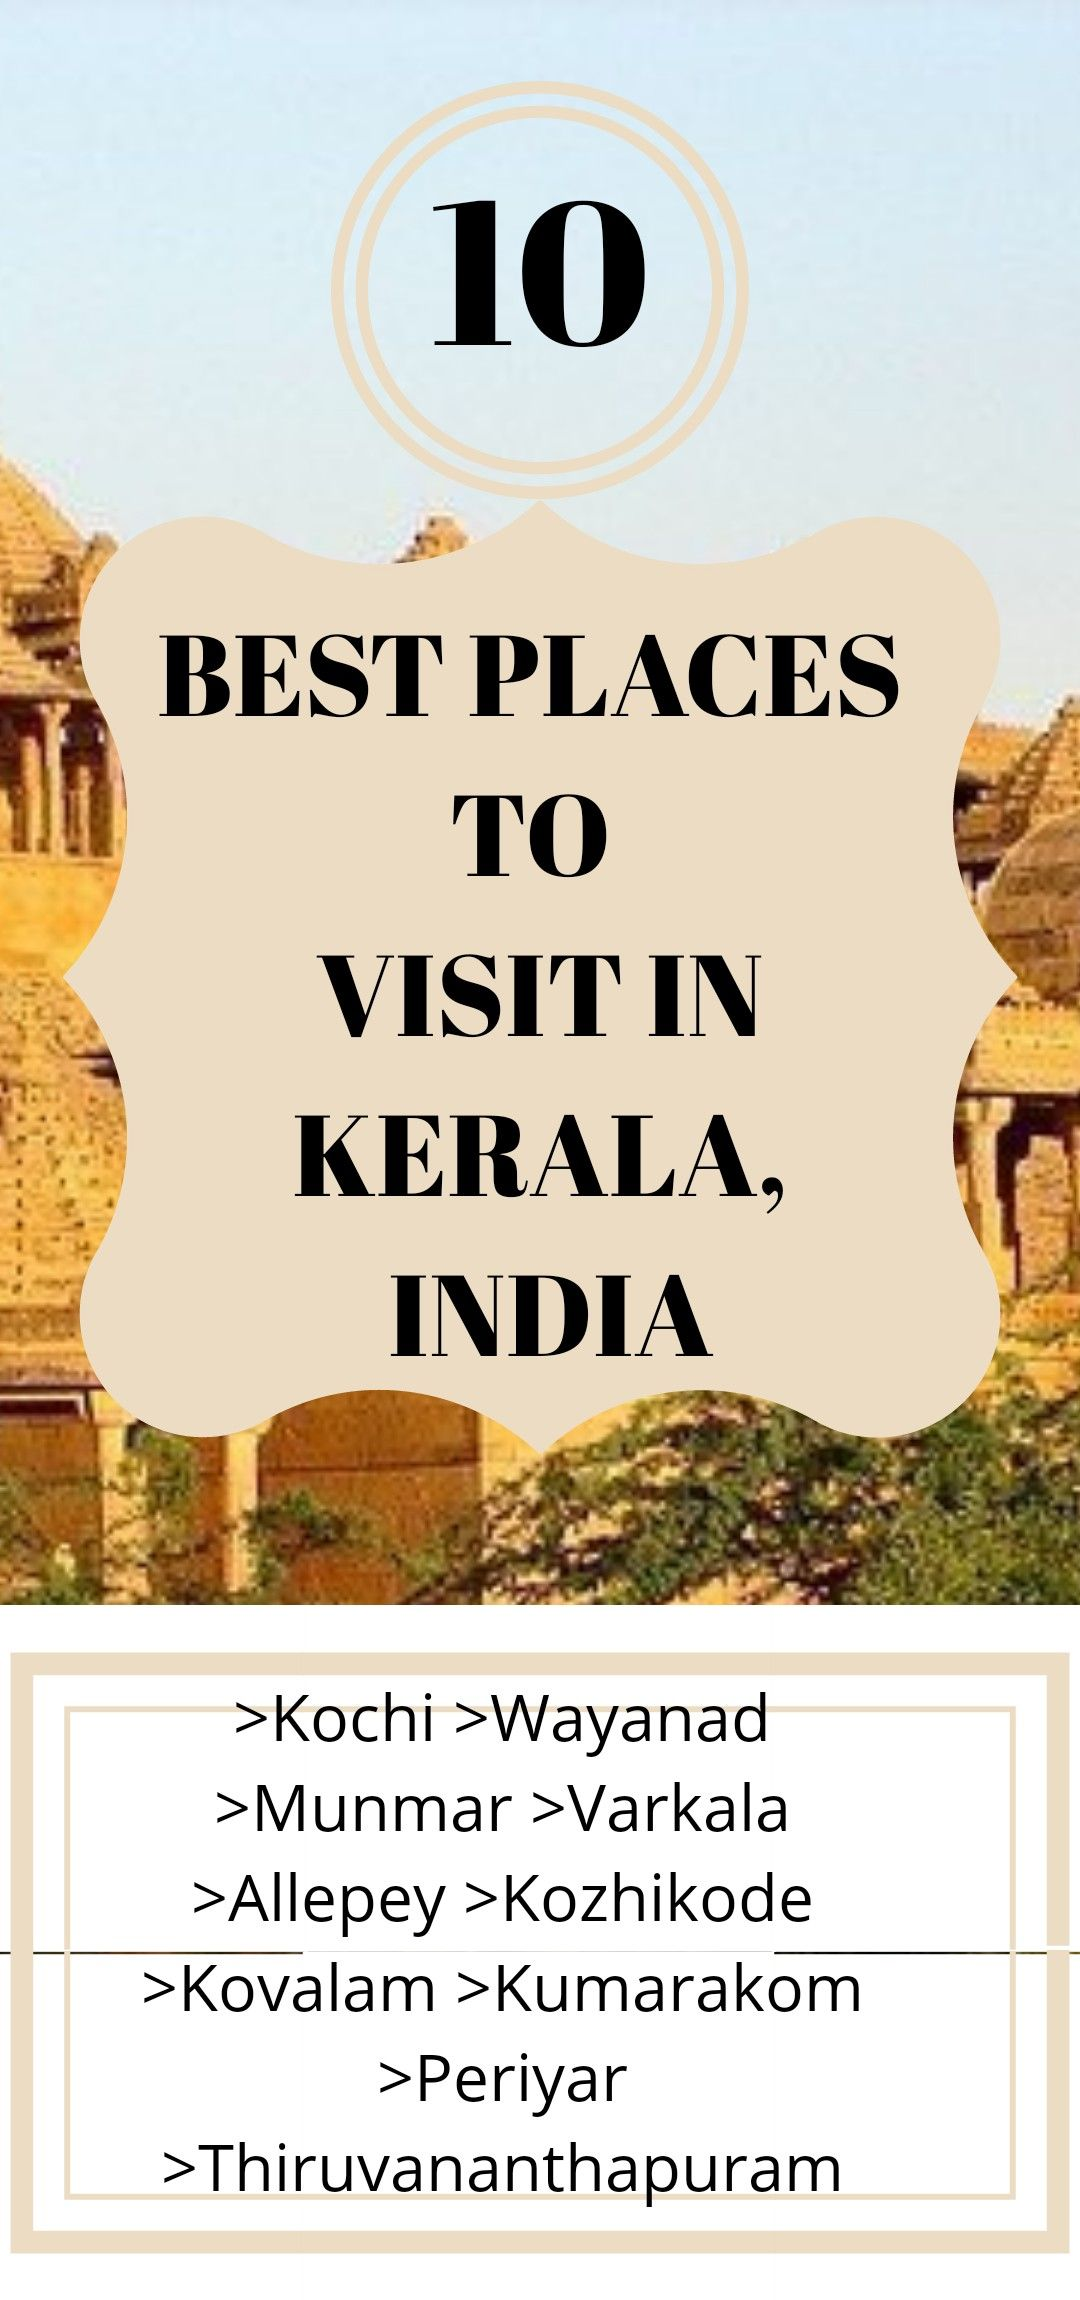 Exploring India: 10 Beautiful Places To Visit In Kerala